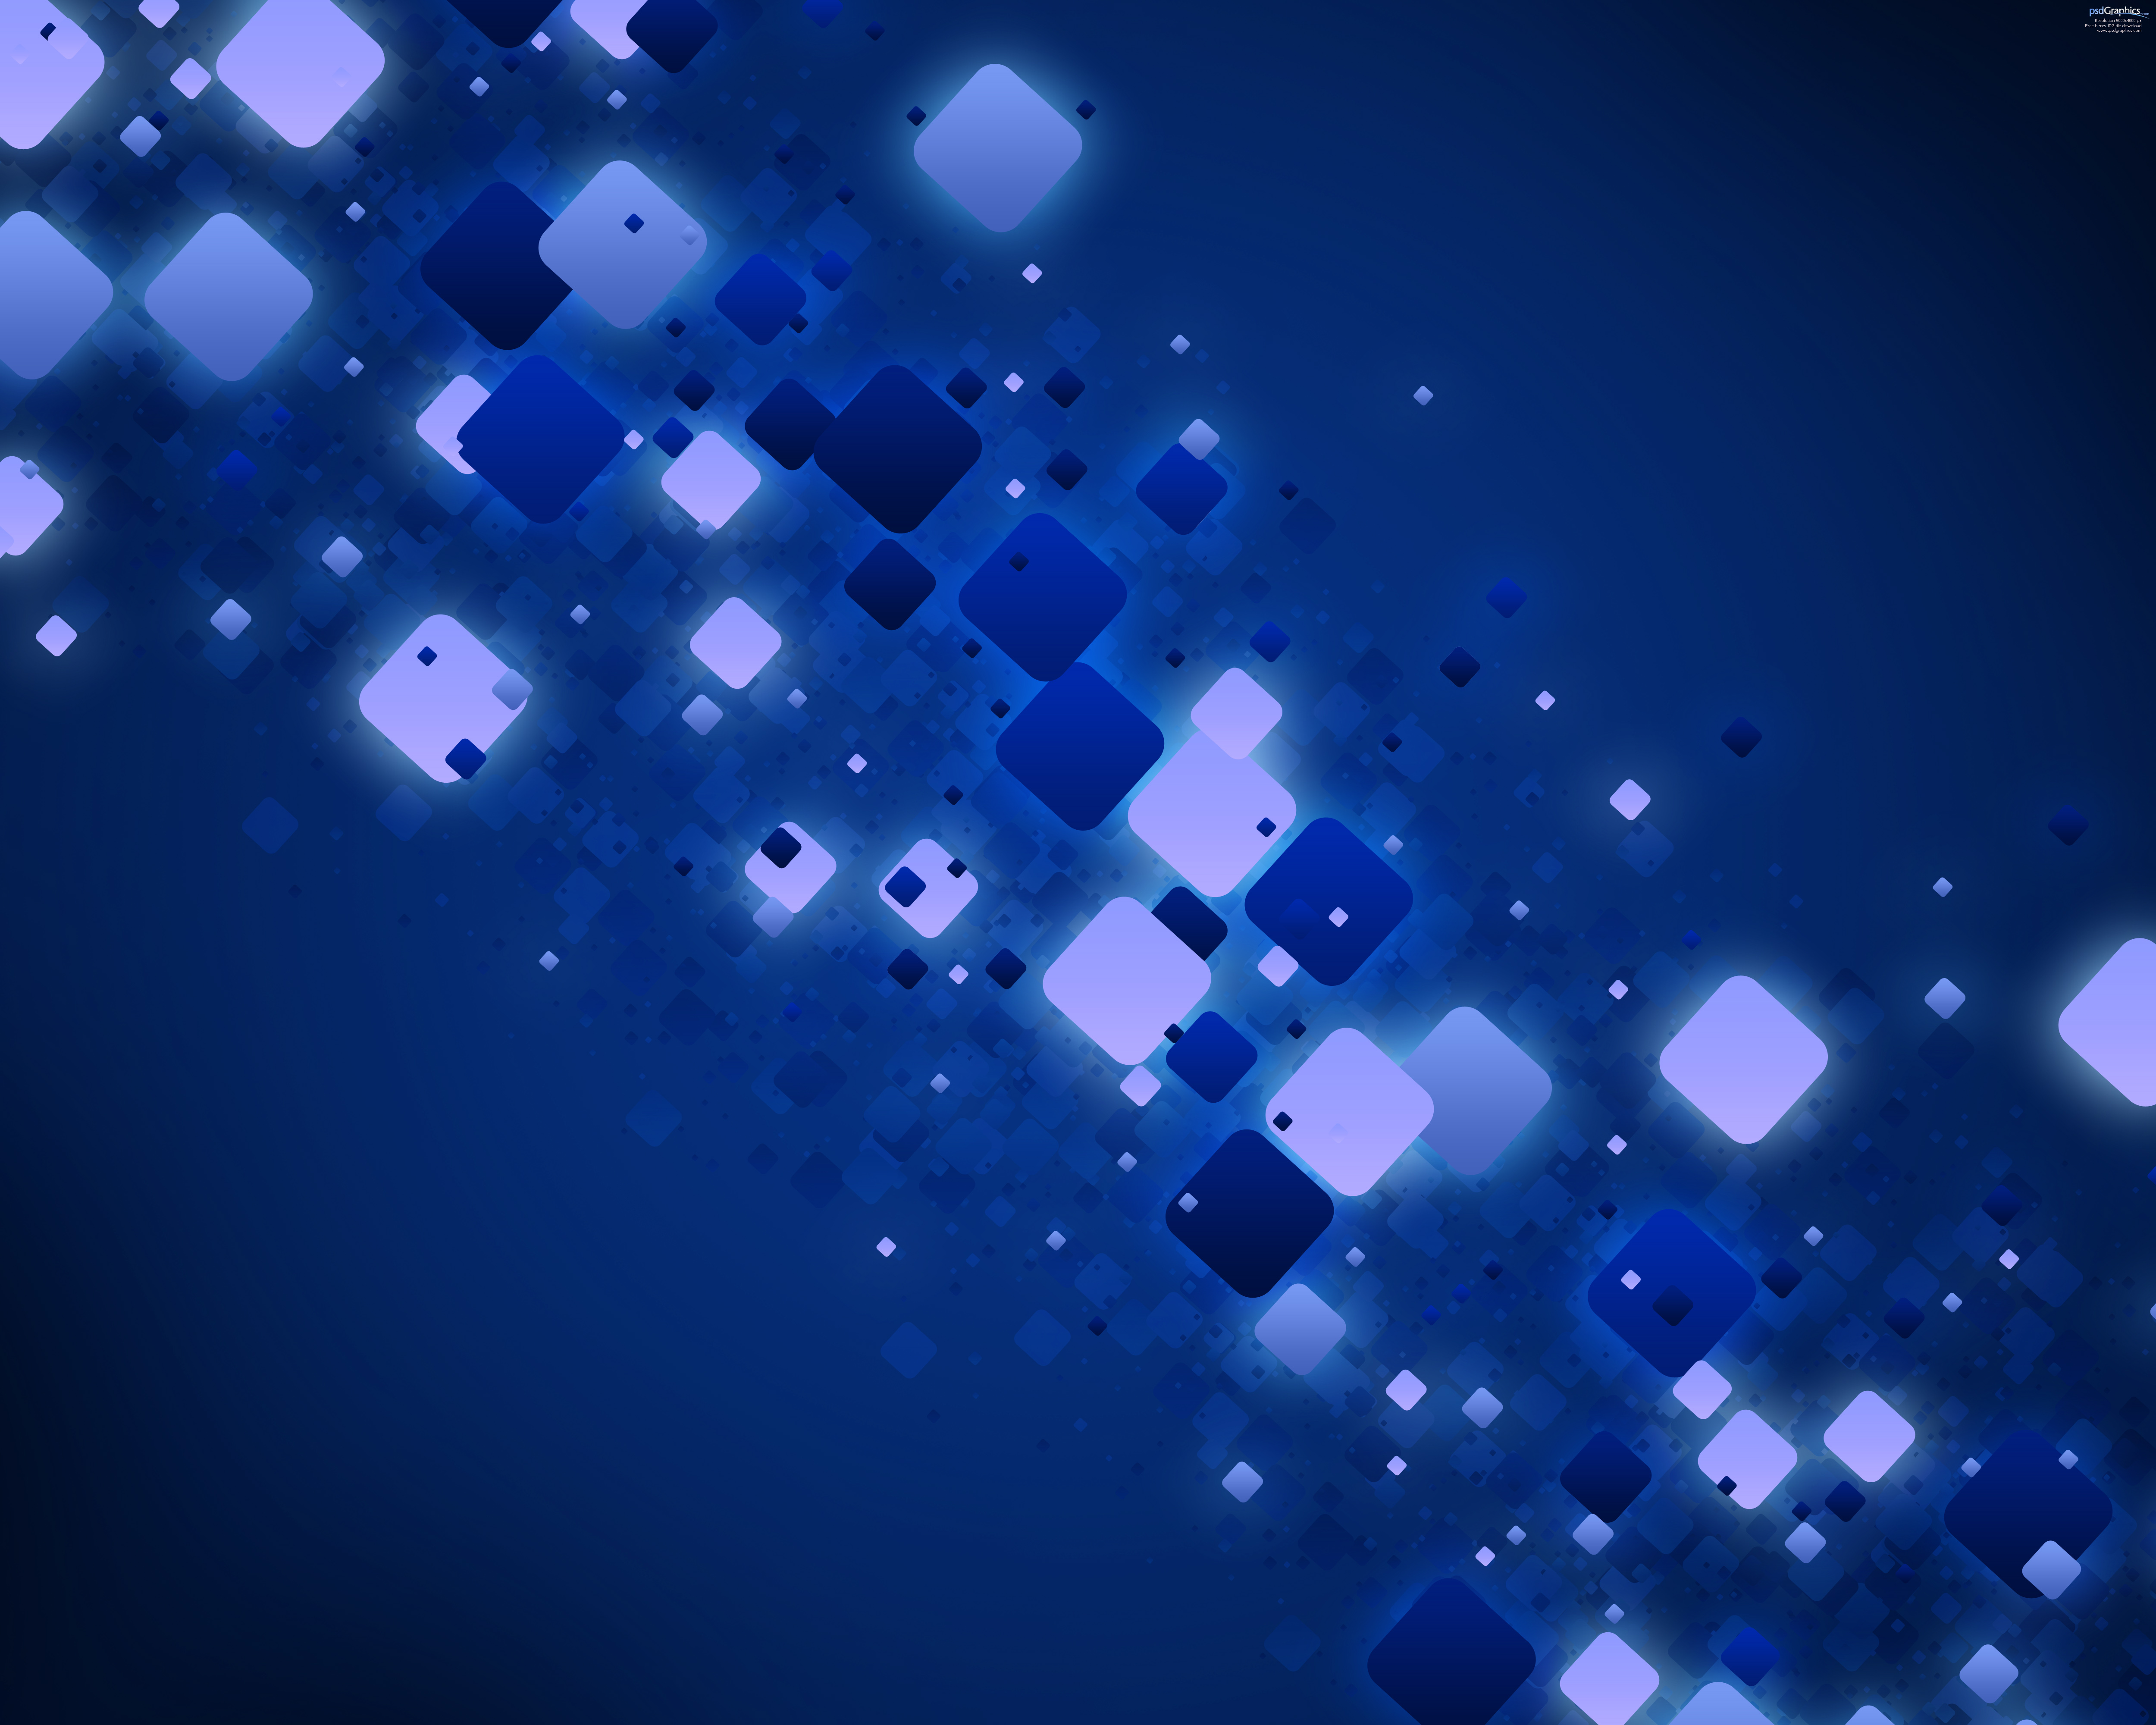 2009 wallpaper blue background 5000x4000